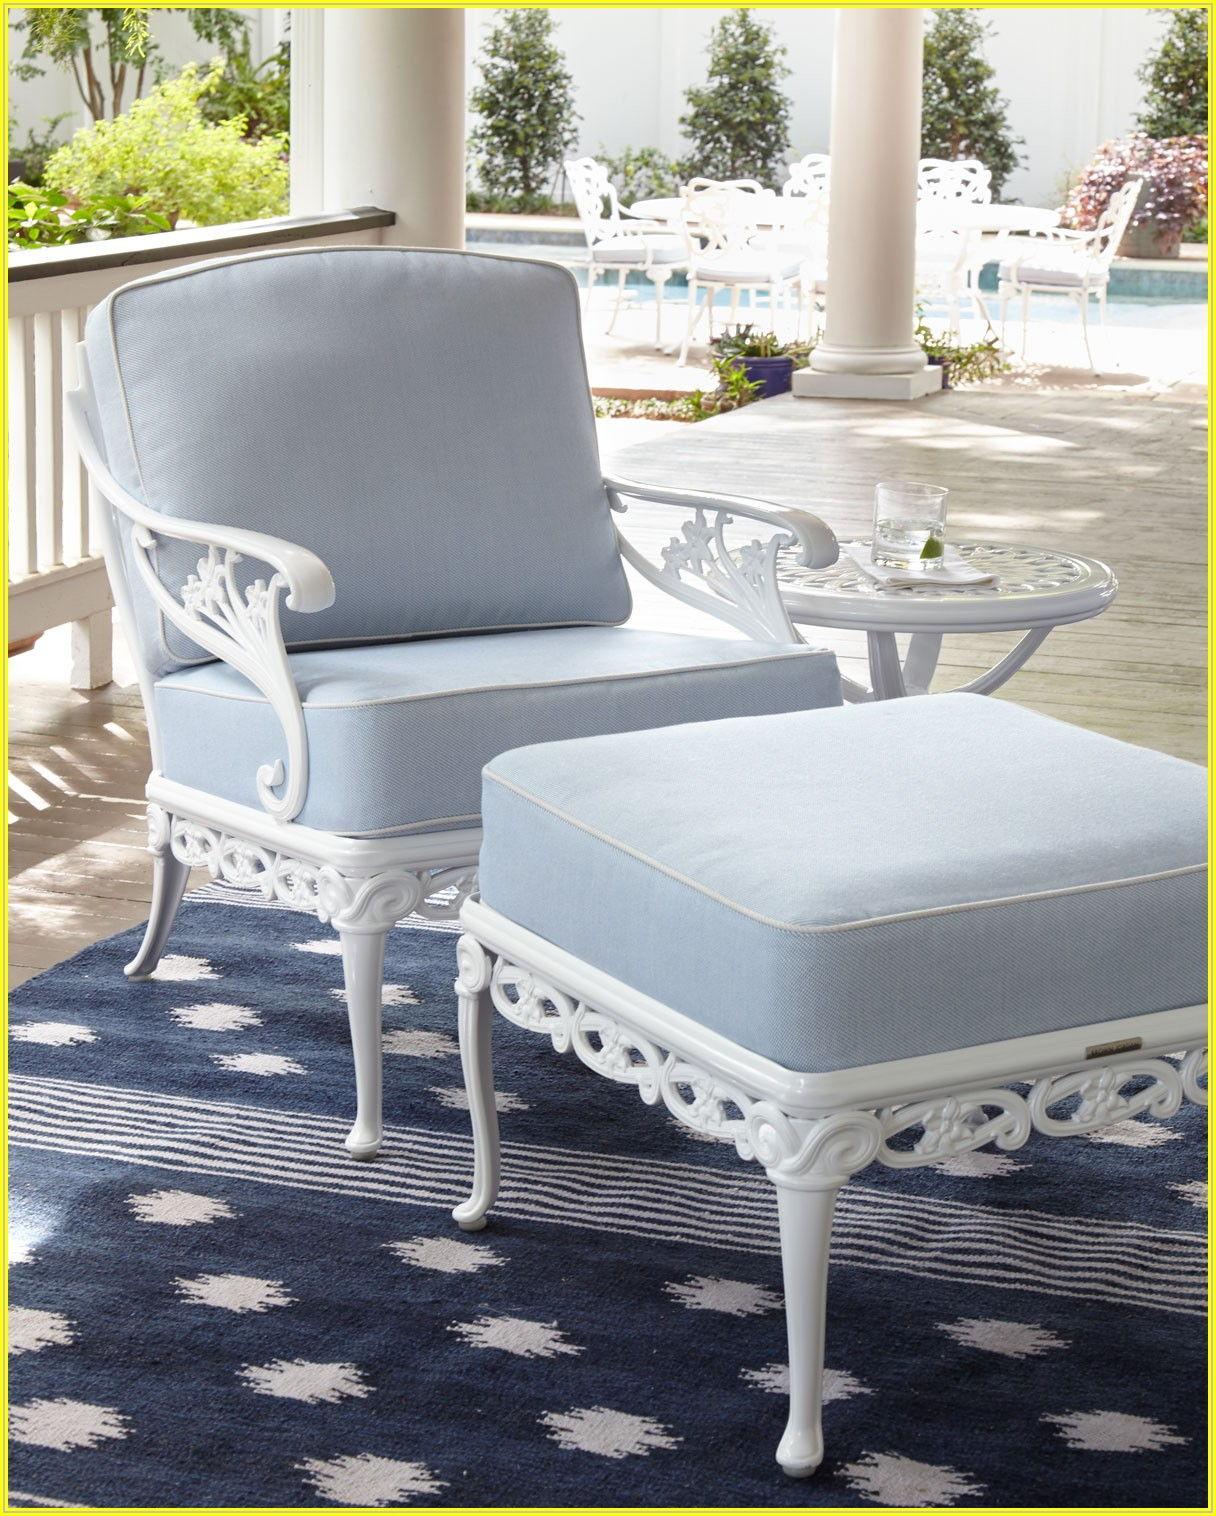 Brown Jordan Patio Chairs